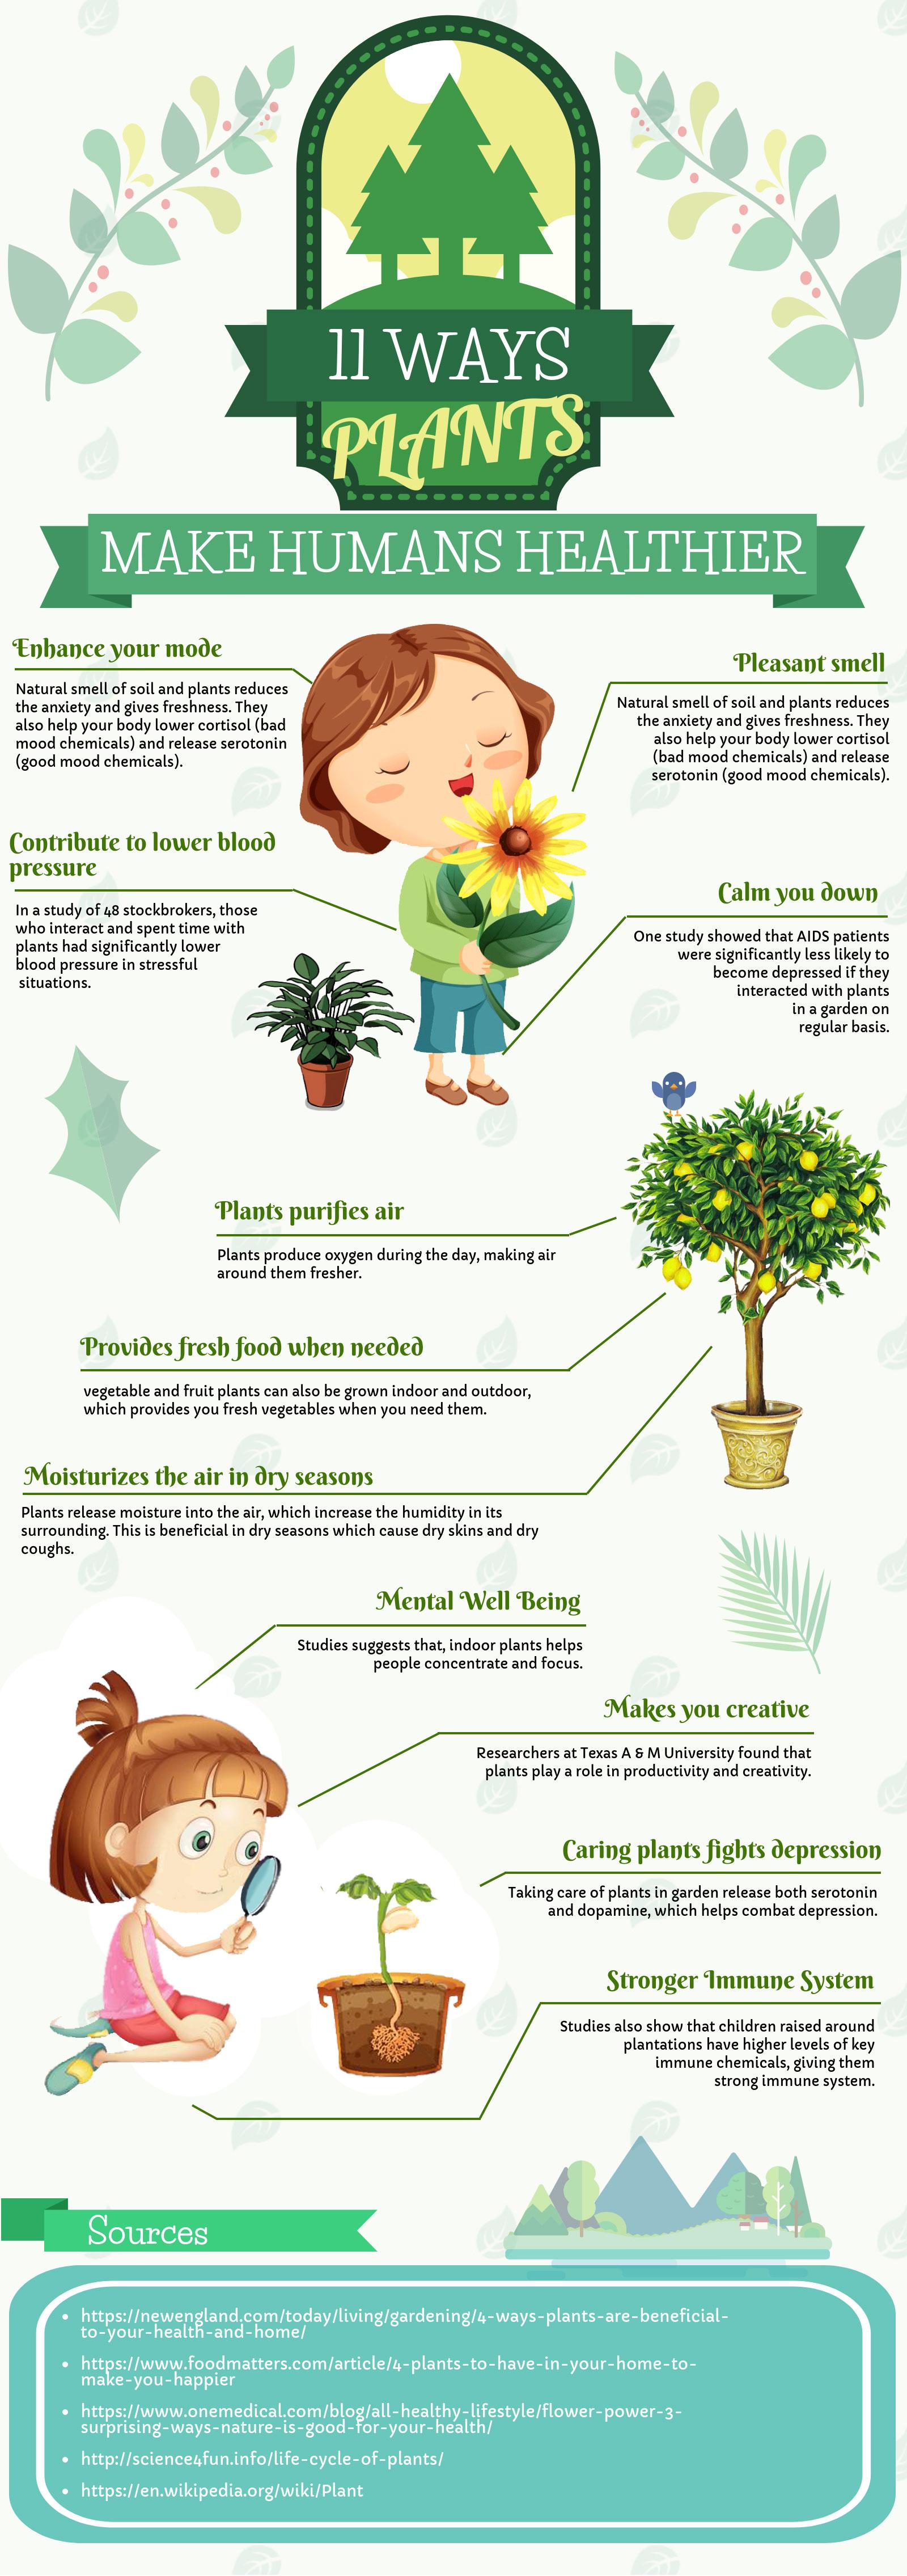 11-ways-plants-make-humans-healthier-infographic